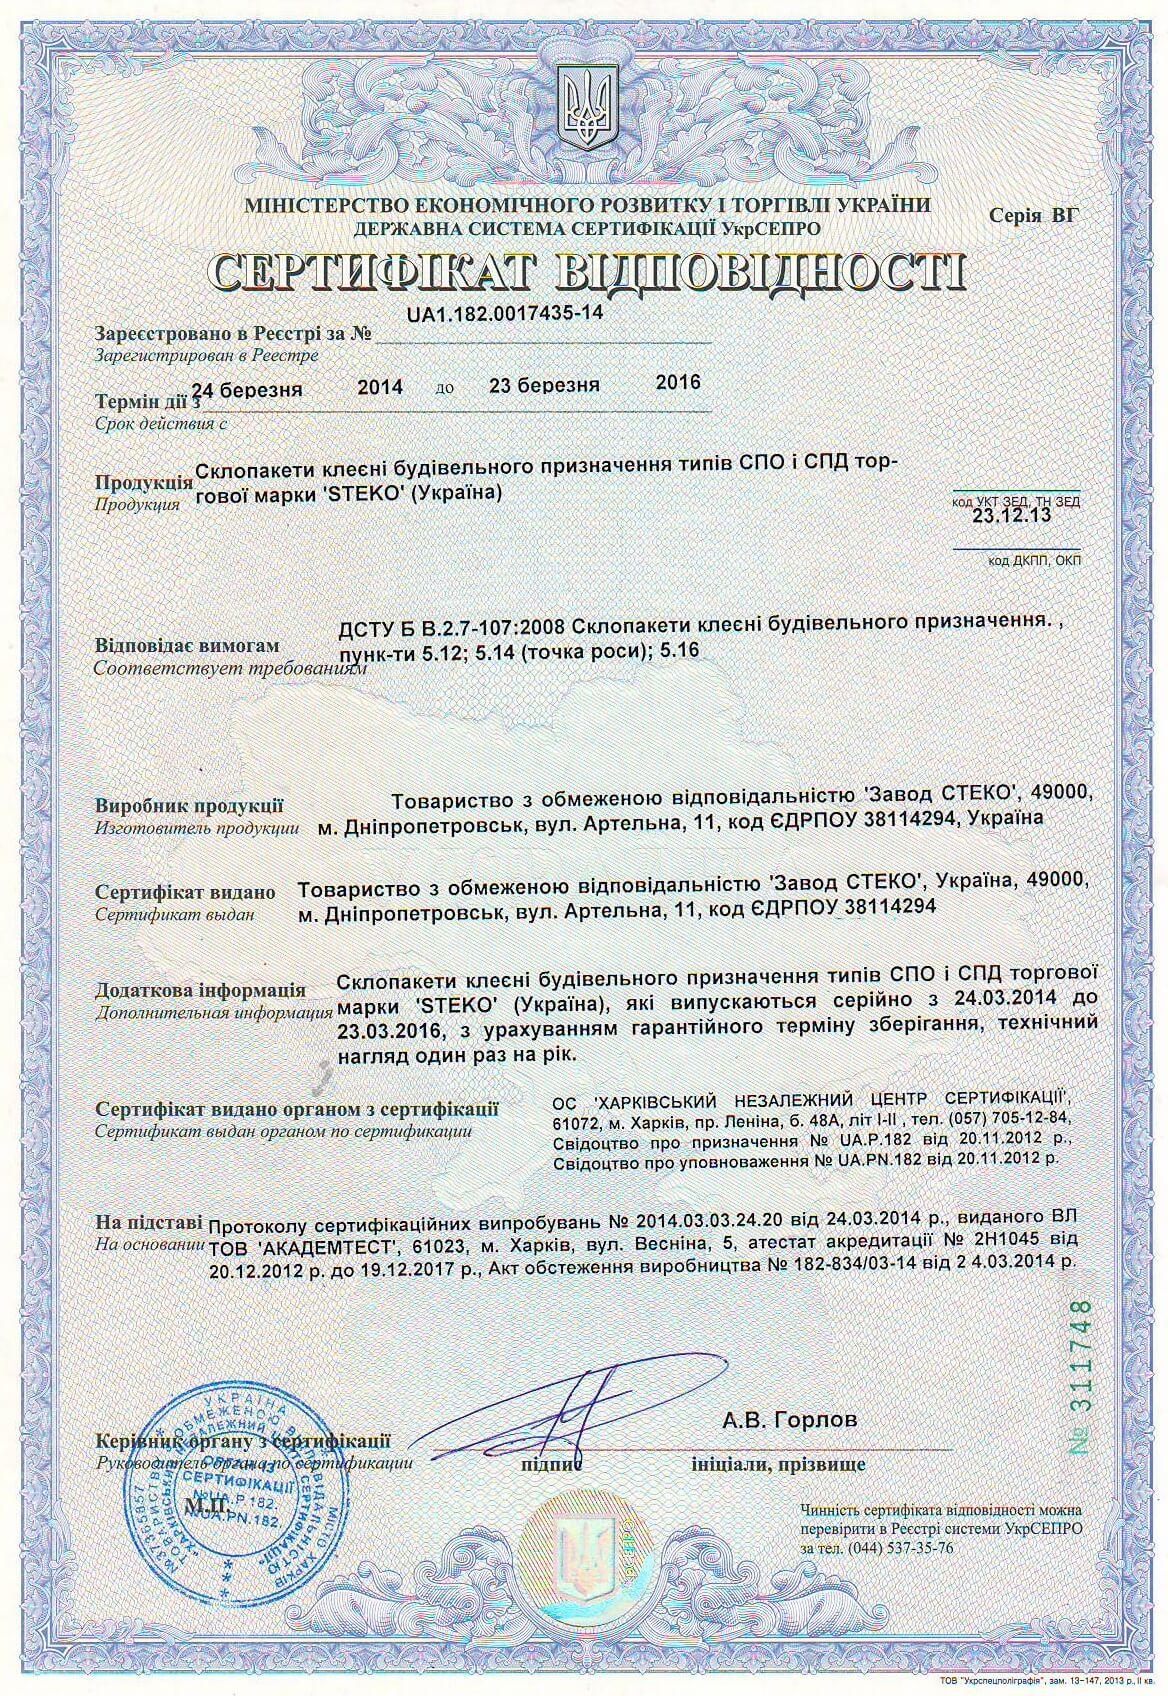 sertisicate-3